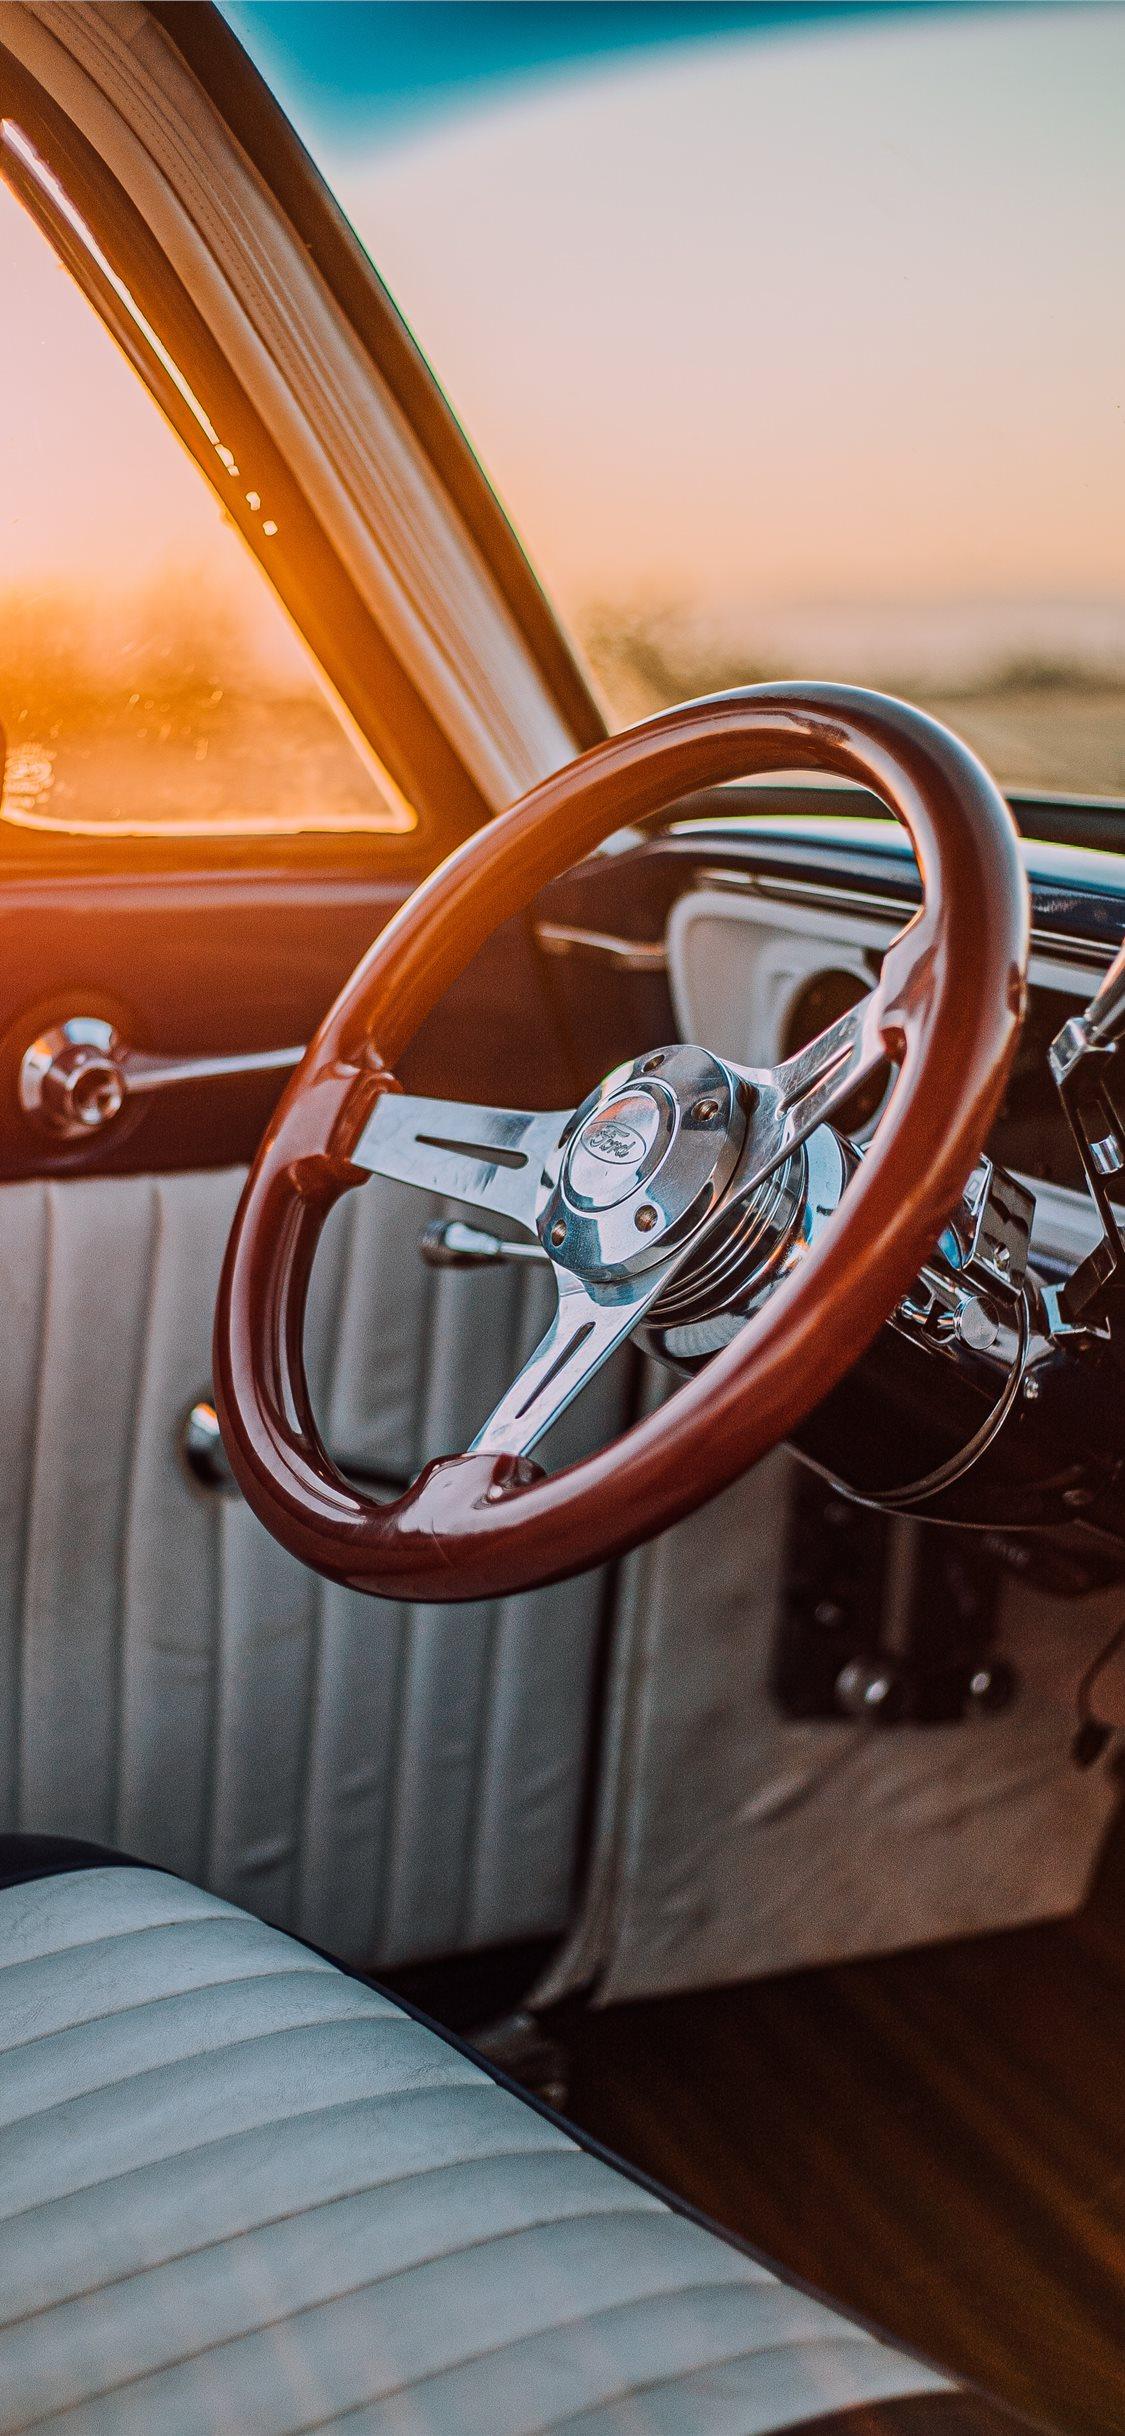 Best Steering Wheel Iphone X Wallpapers Hd 2020 Ilikewallpaper